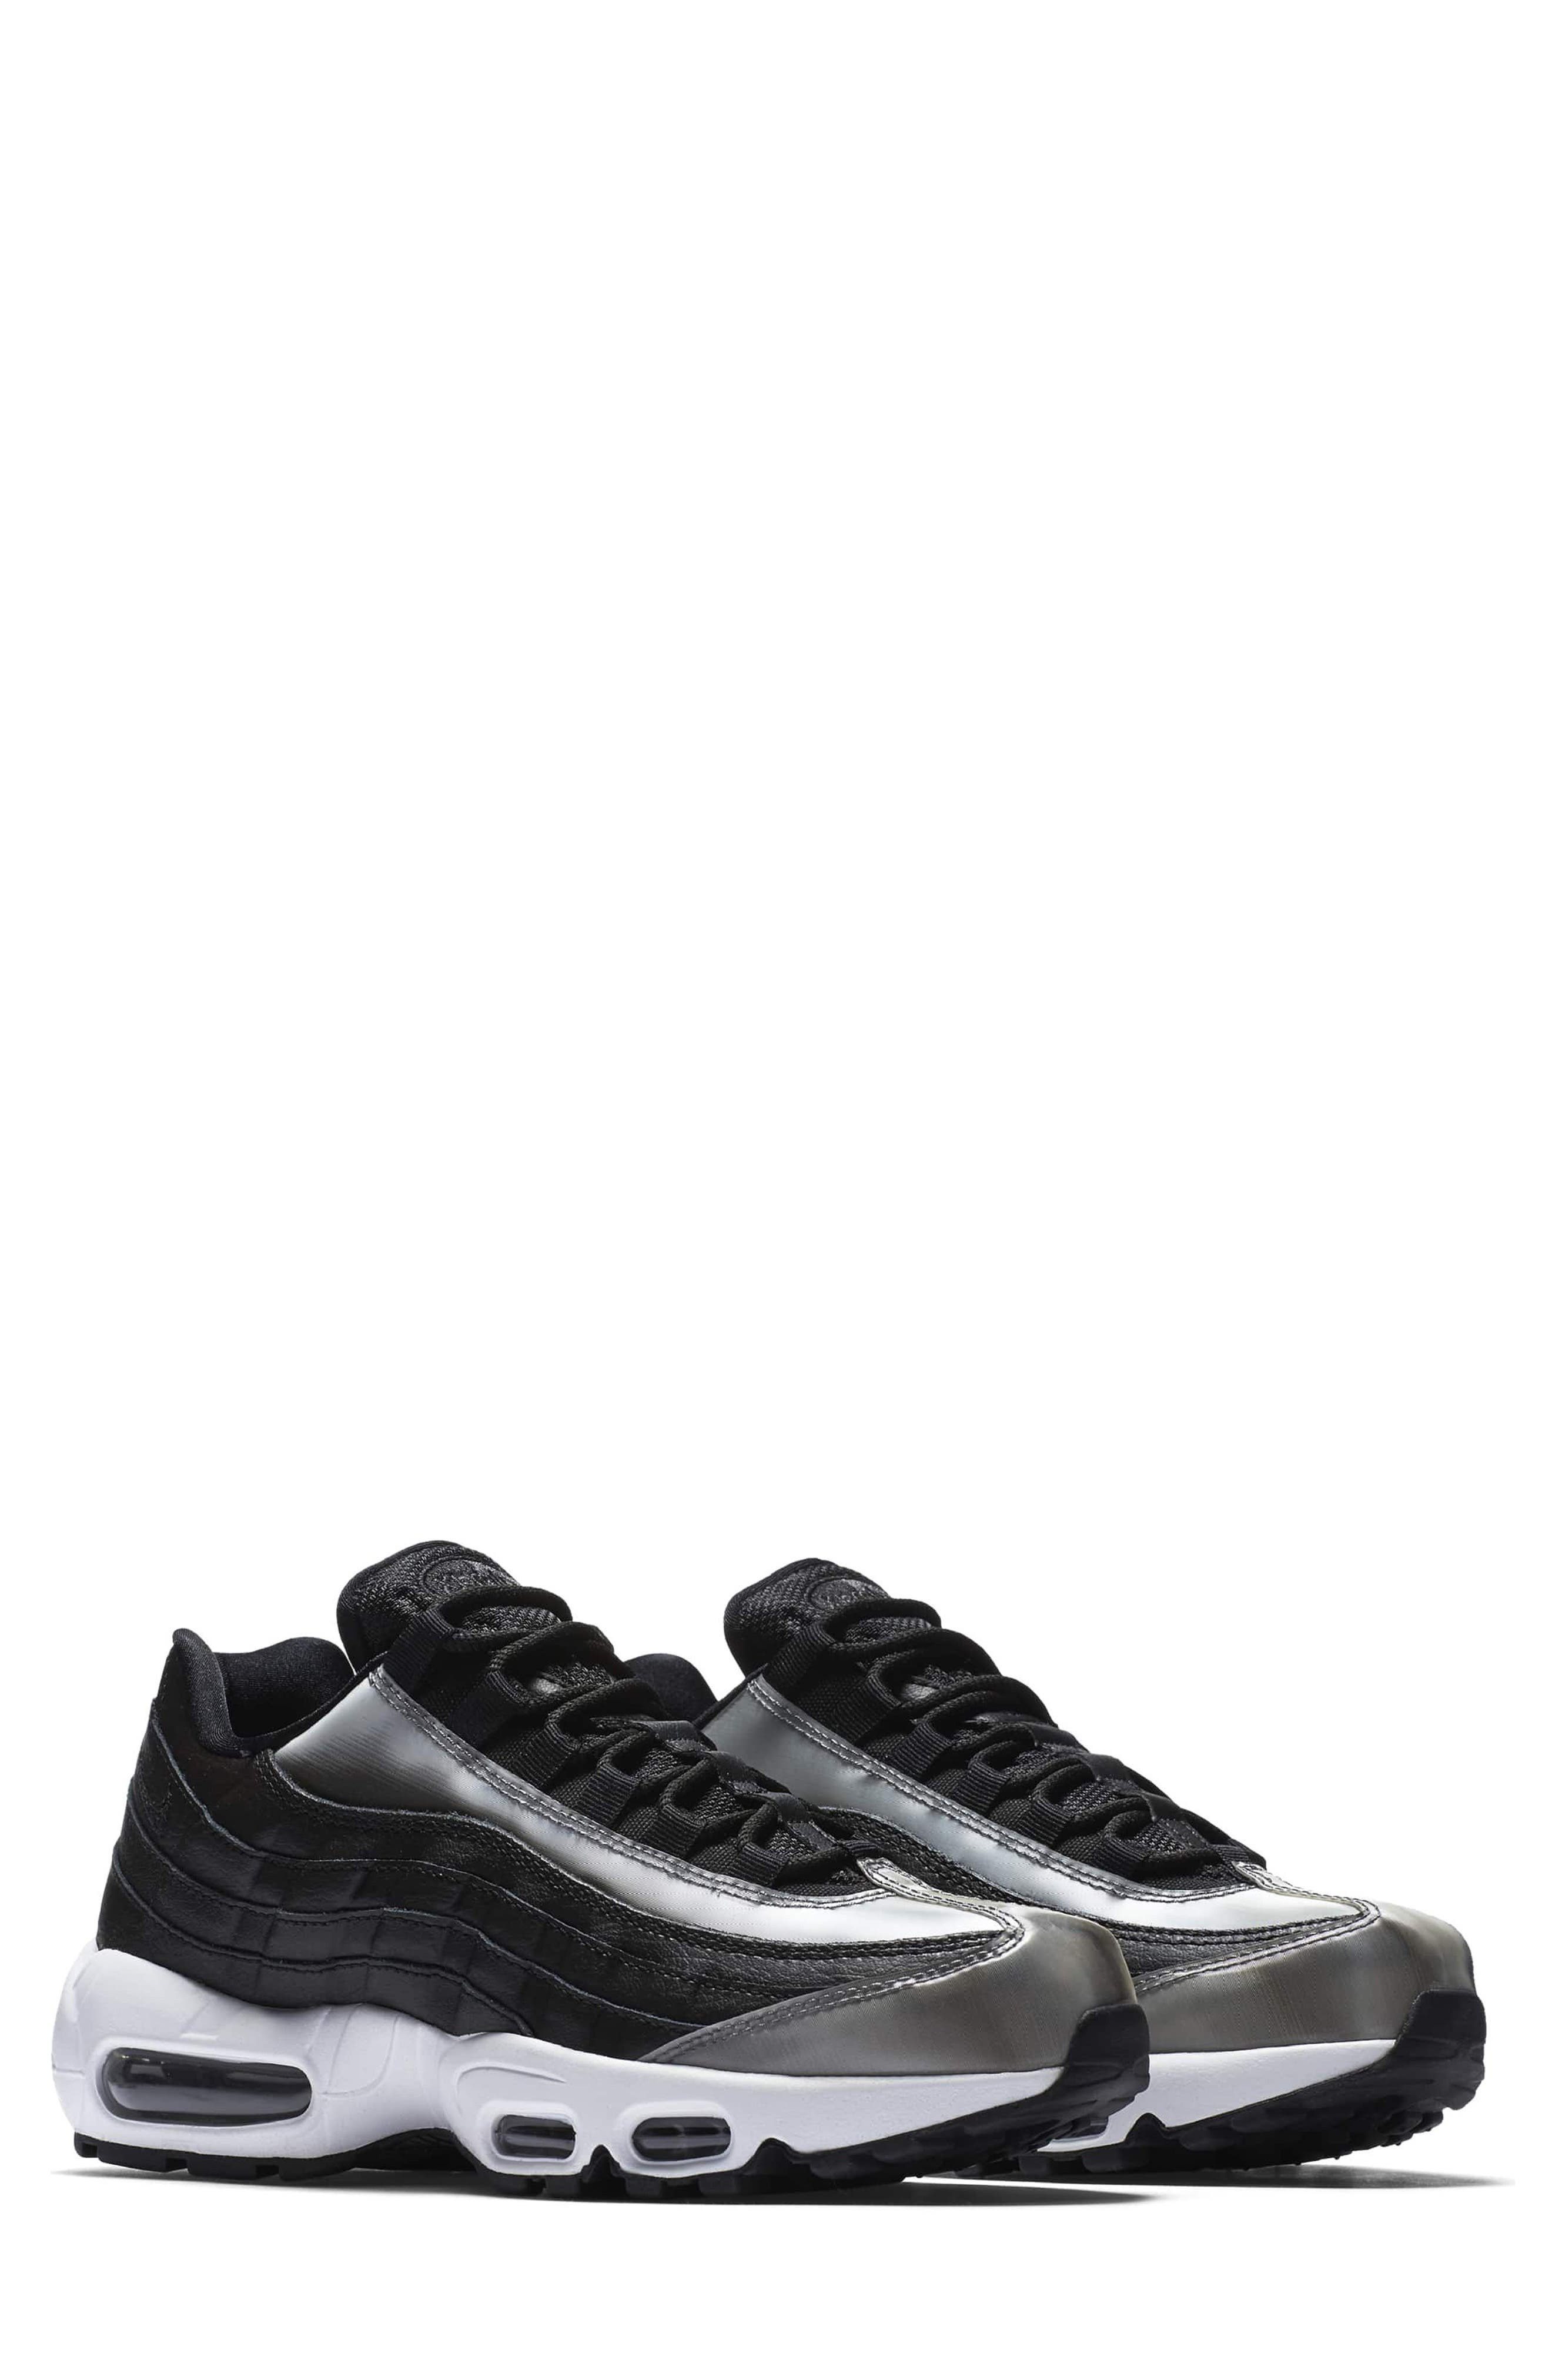 Nike Air Max 95 SE Running Shoe (Women)